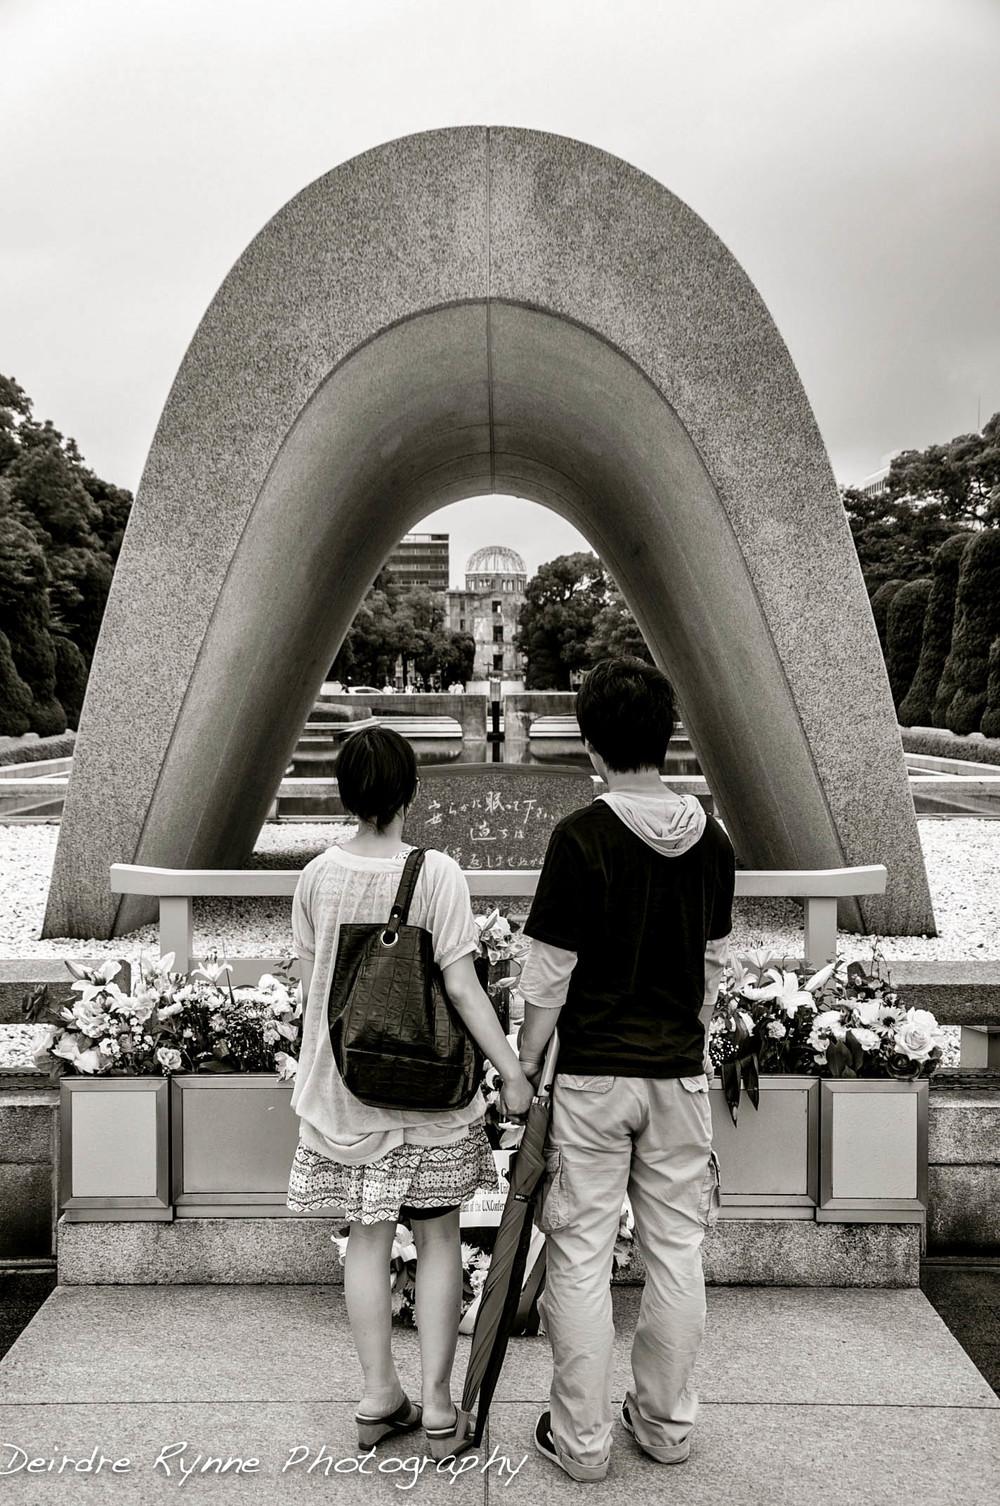 Hiroshima Flame- Hiroshima, Japan. July 2012.